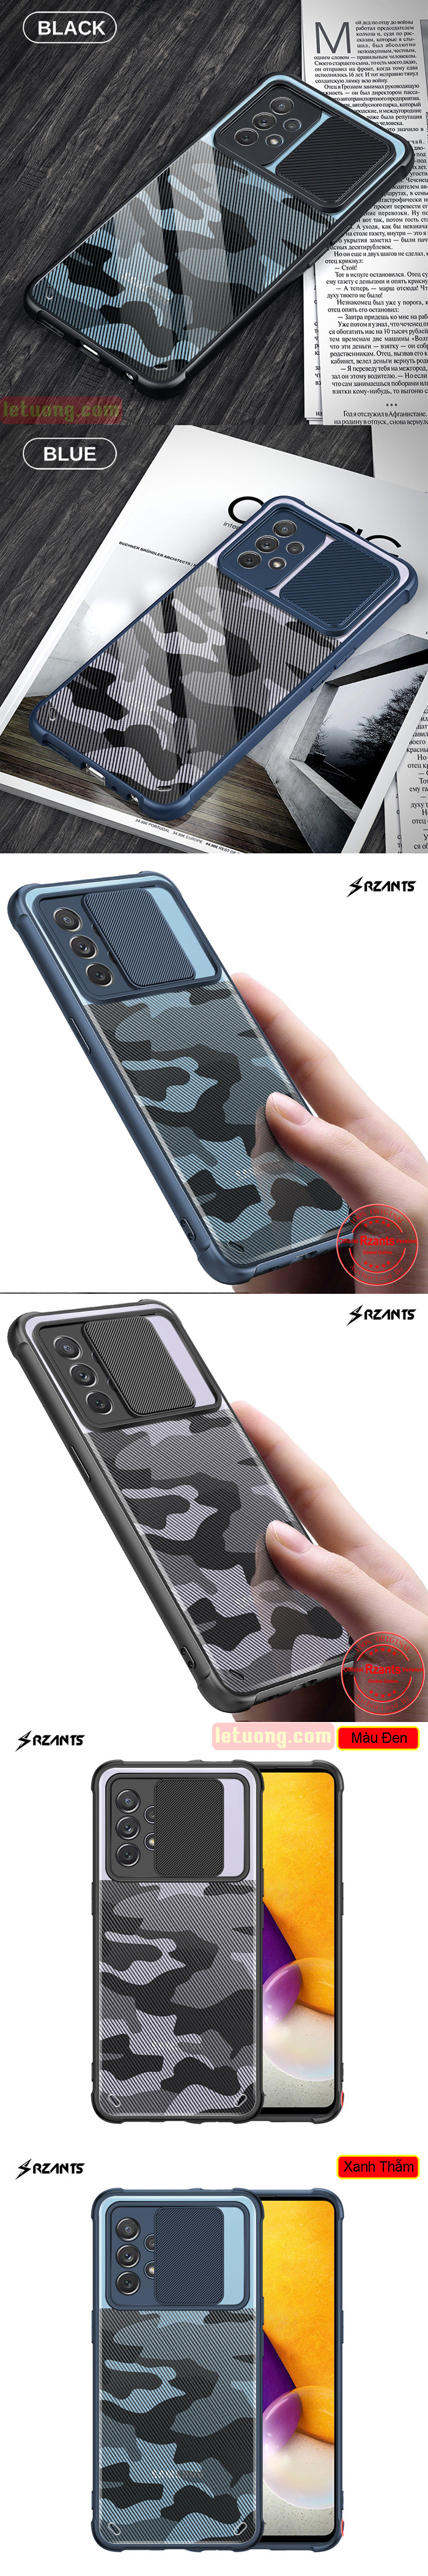 Ốp lưng Samsung A52, A52 5G Rzants Armor Camo bảo vệ camera 5